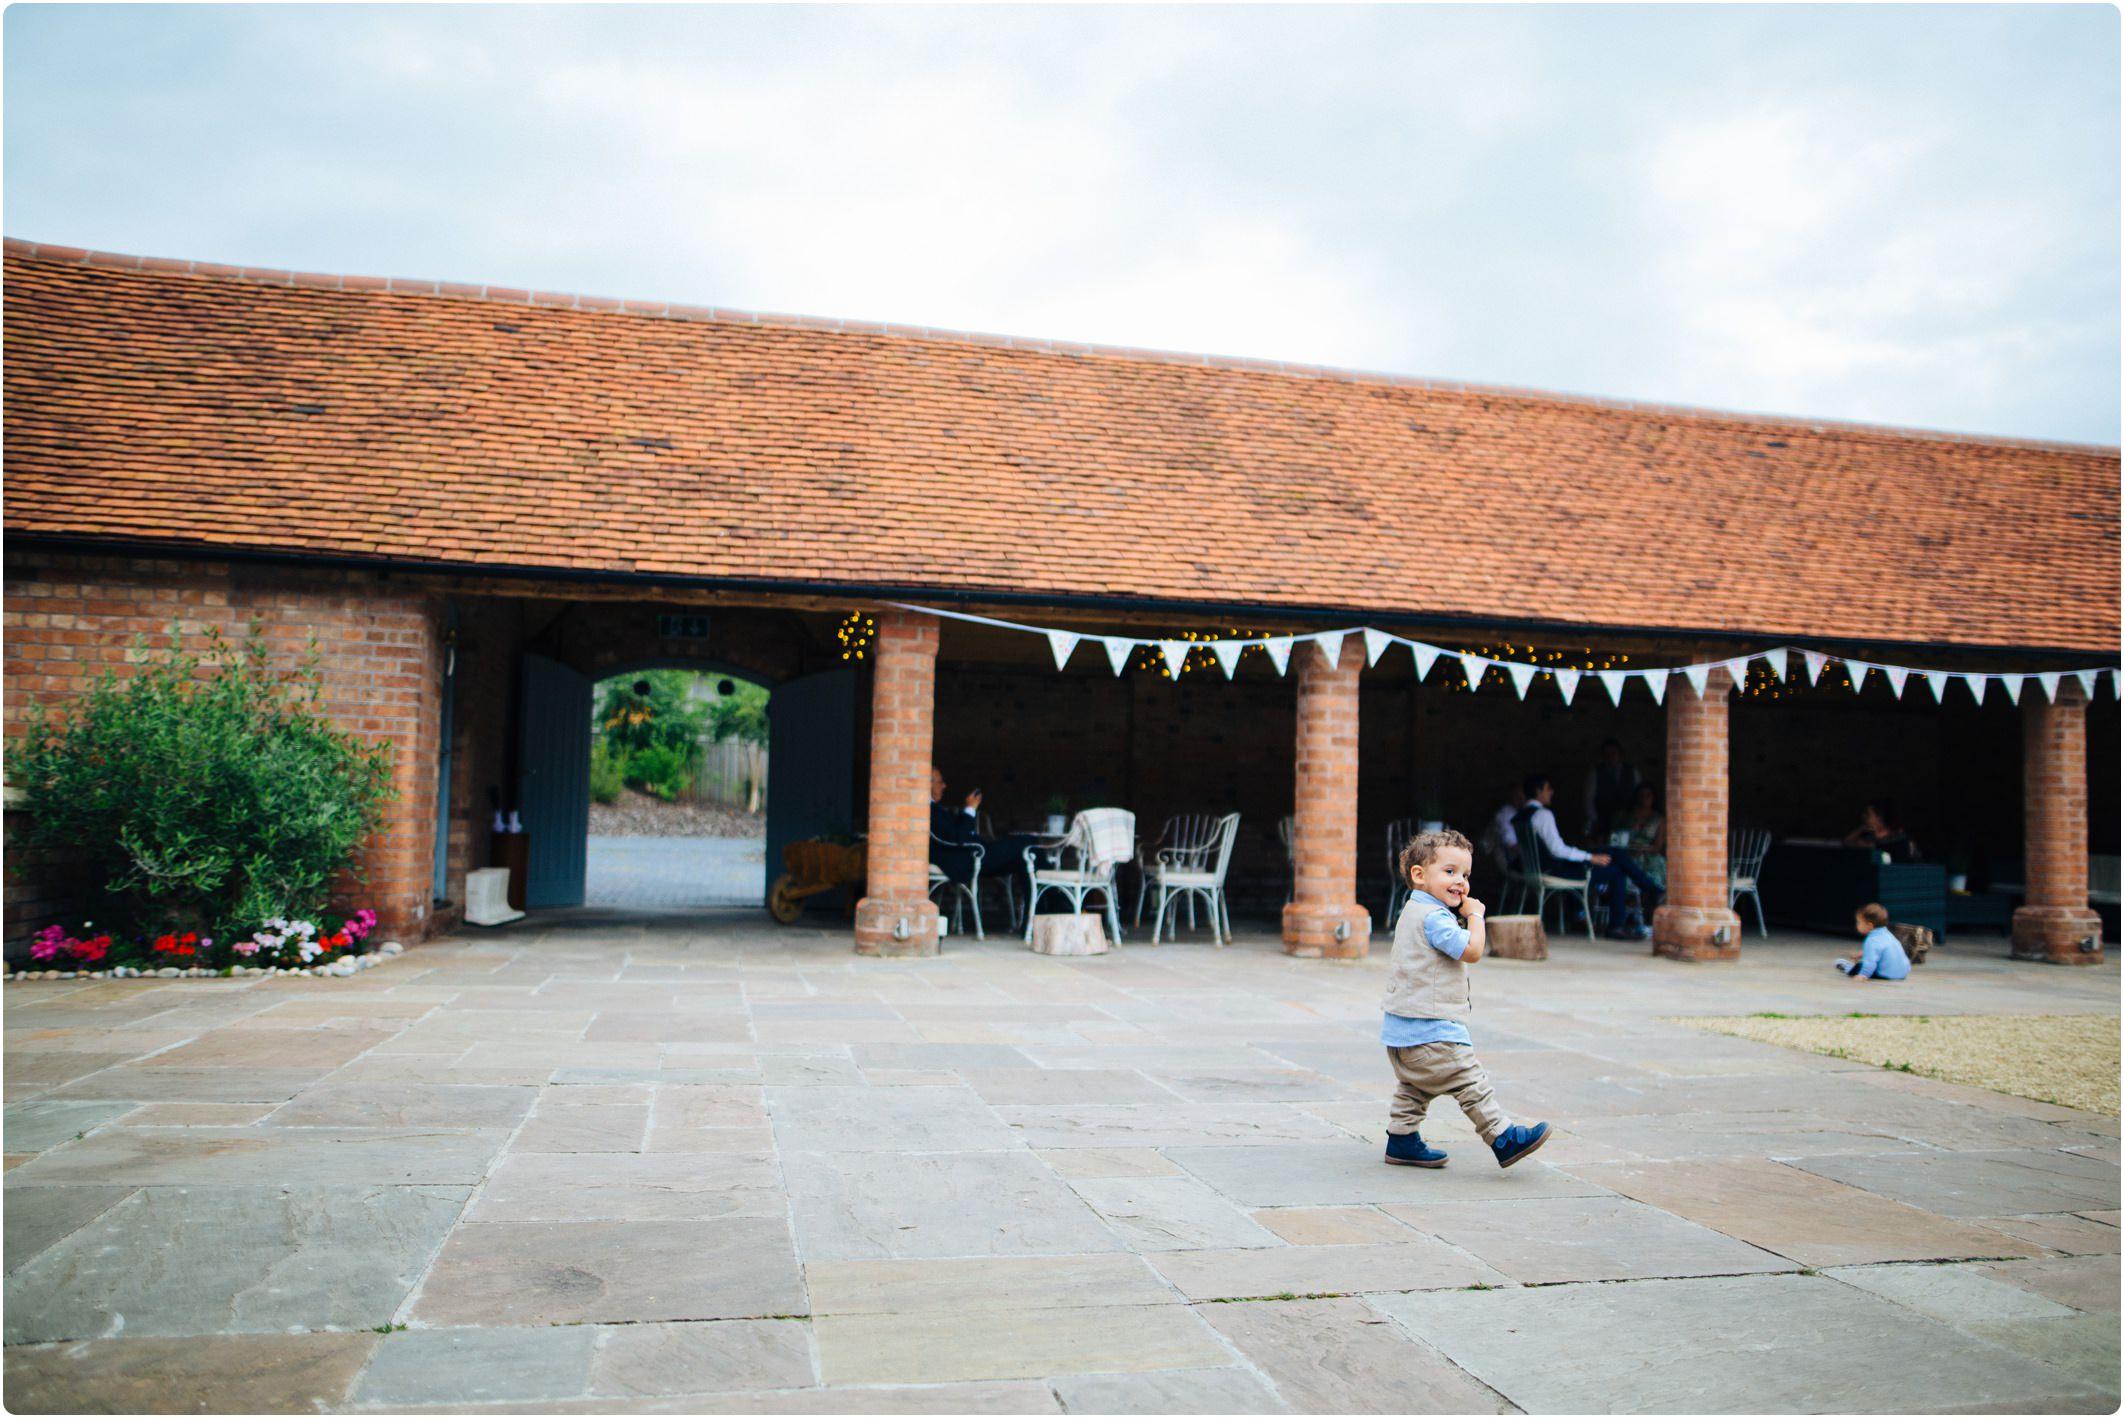 Swallows Nest Barn courtyard